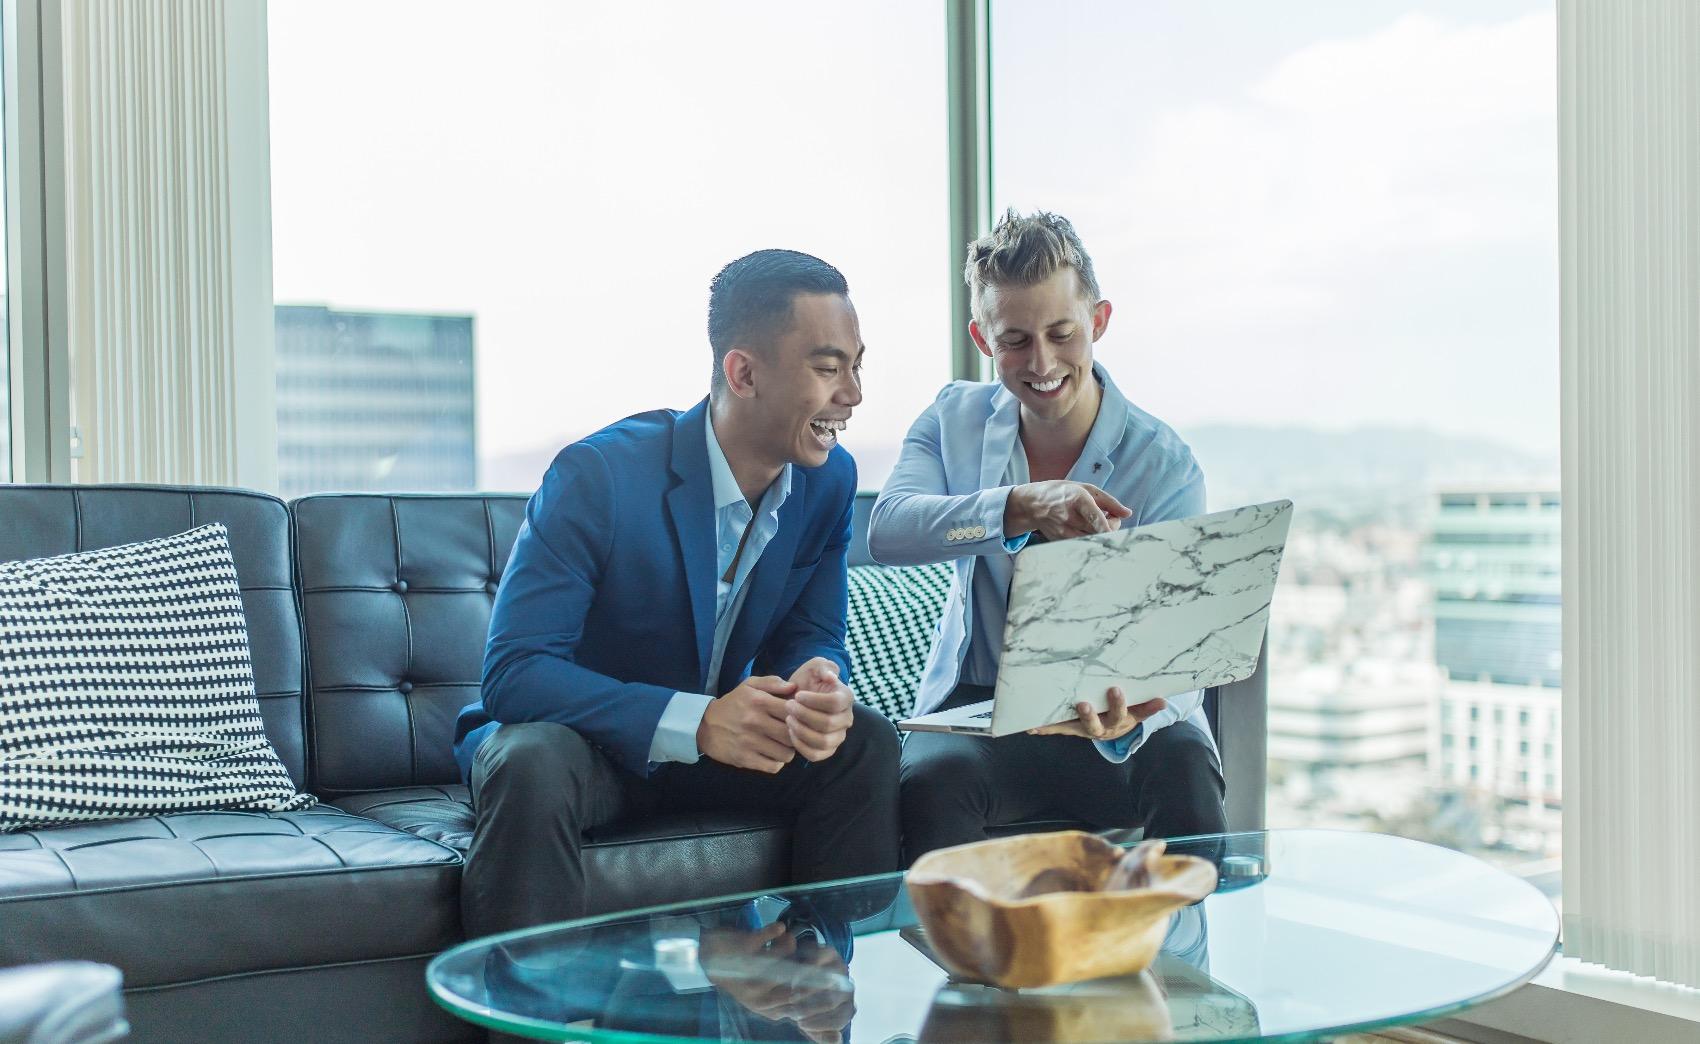 Empresas de contabilidade: Como as avaliar?